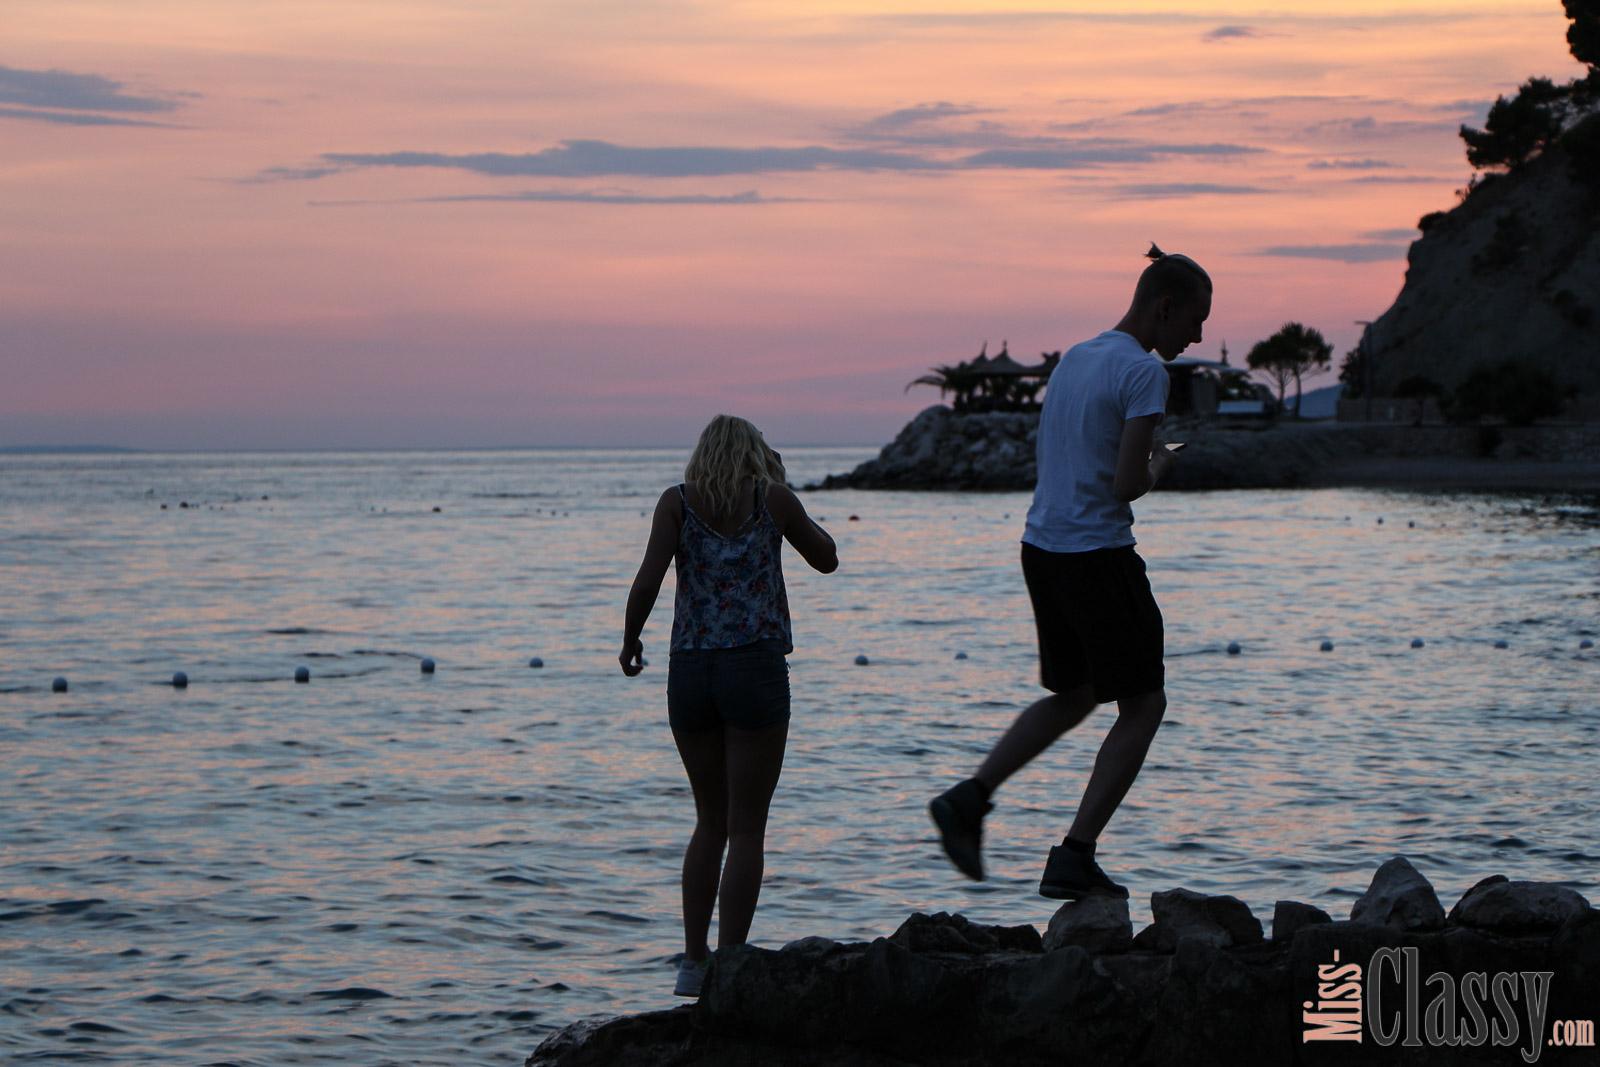 TRAVEL Strandurlaub in Brela - die Perle an der Makarska Riviera, Miss Classy, miss-classy.com, Lifestyleblog, Lifestyleblogger, Lifestyleblog Graz, Travelblog, Travelblogger, Graz, Steiermark, Österreich, classy, beclassy, Reise, Travel, Wanderlust, Wayfarer, Kroatien, Croatia, Brela, Makarska, Makarska Riviera, Strand, kristallklares Wasser, Beach Life